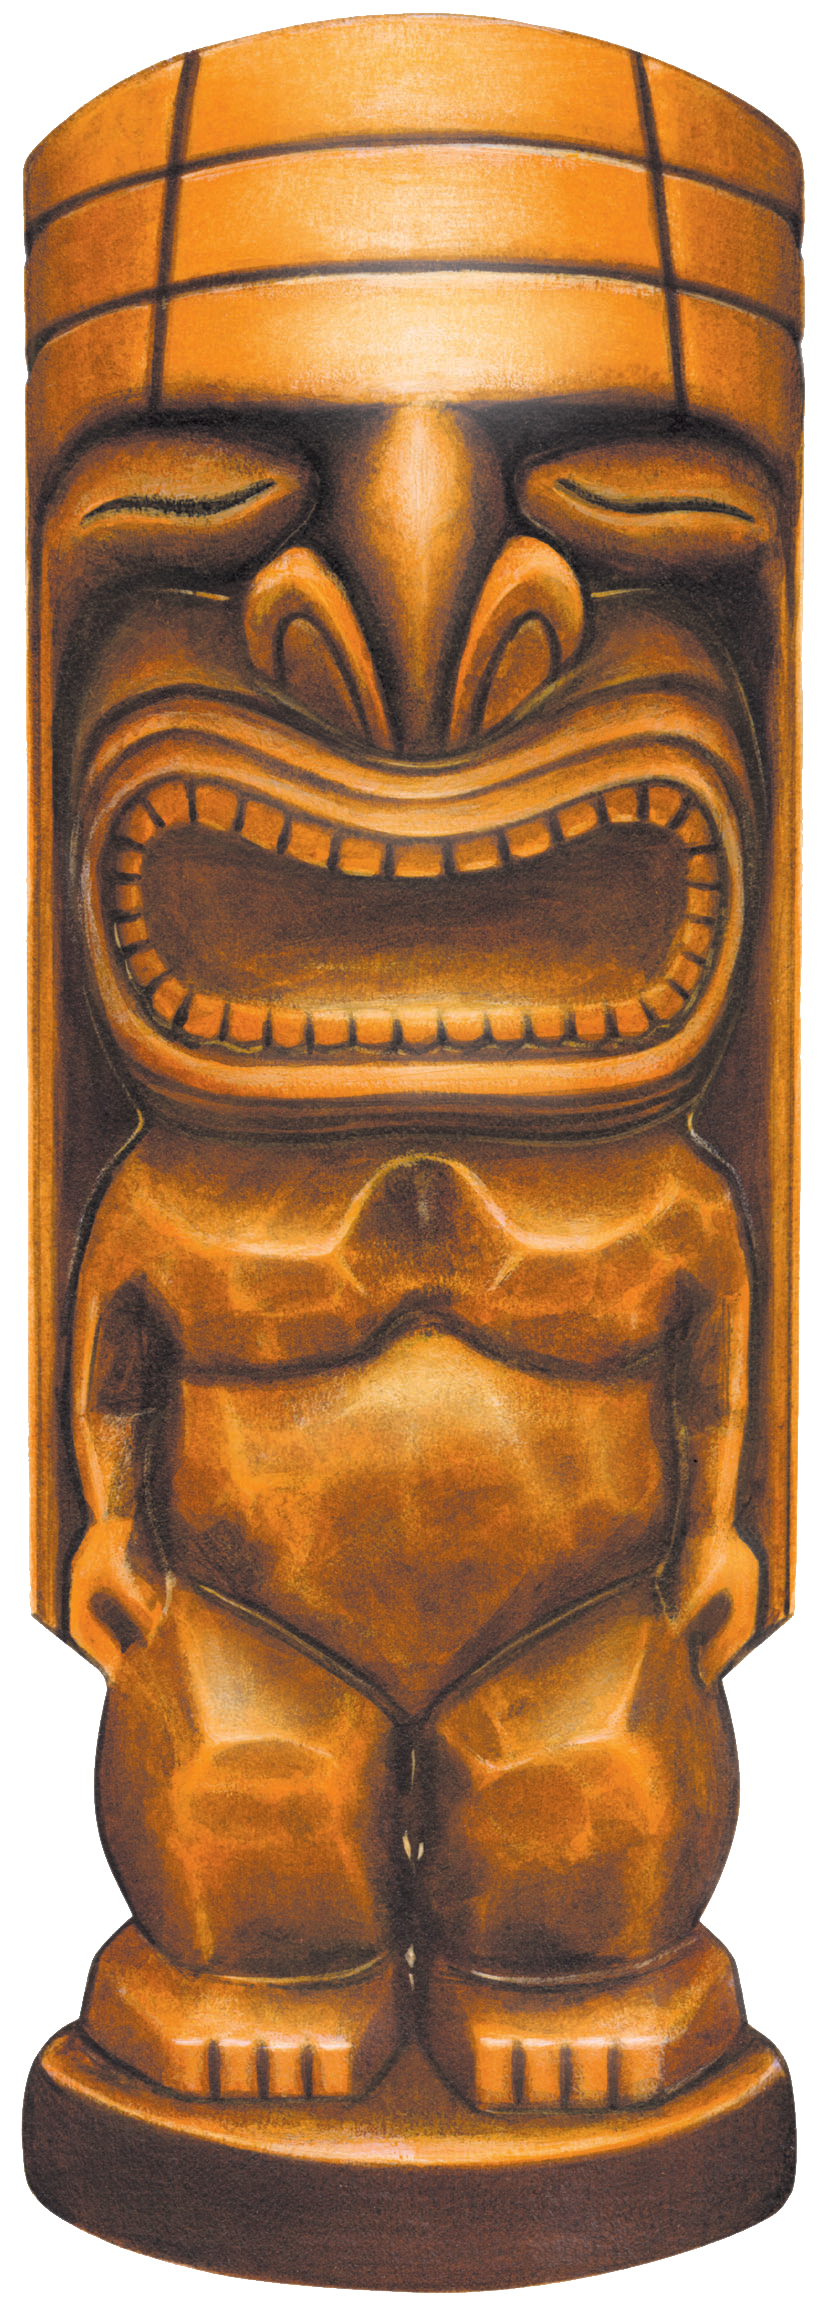 Tiki transparent PNG by AbsurdWordPreferred